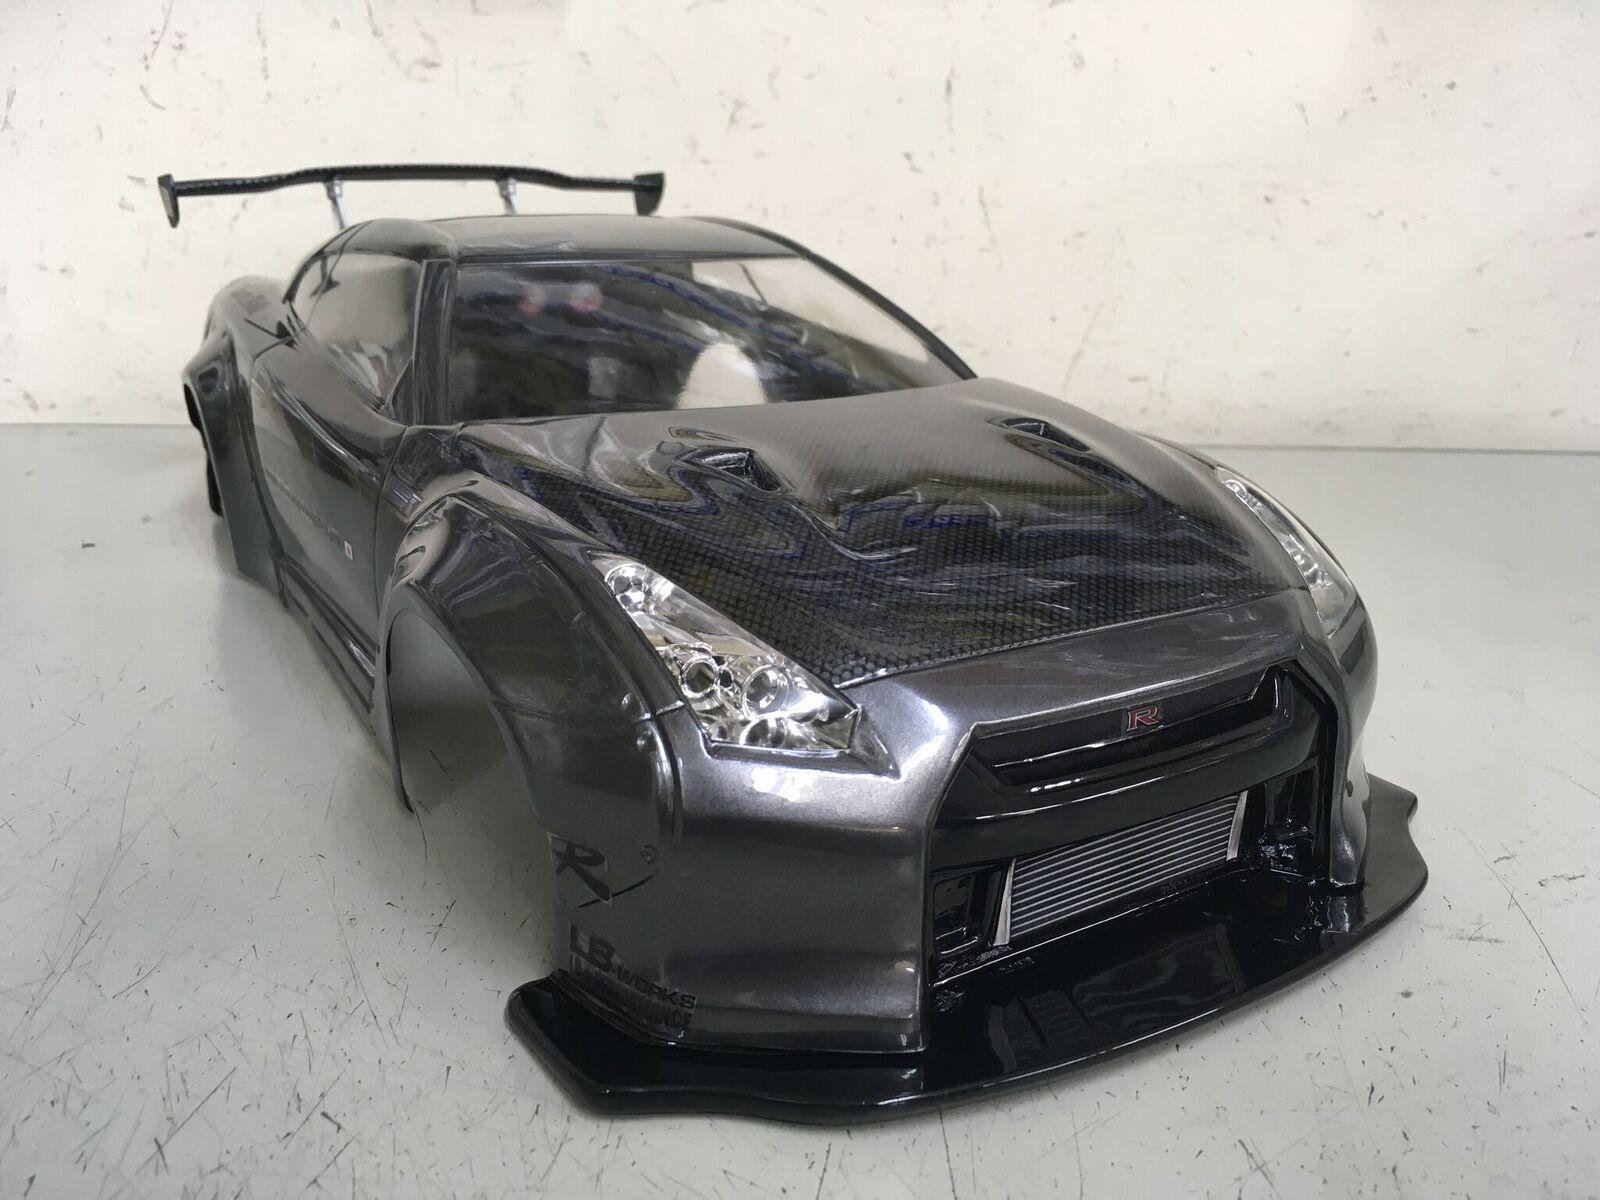 TETSUJIN 鉄人 NISSAN GT-R 【R35】LB☆PERFORMANCE ver.カーボン調ボンネット(ガンメタ)